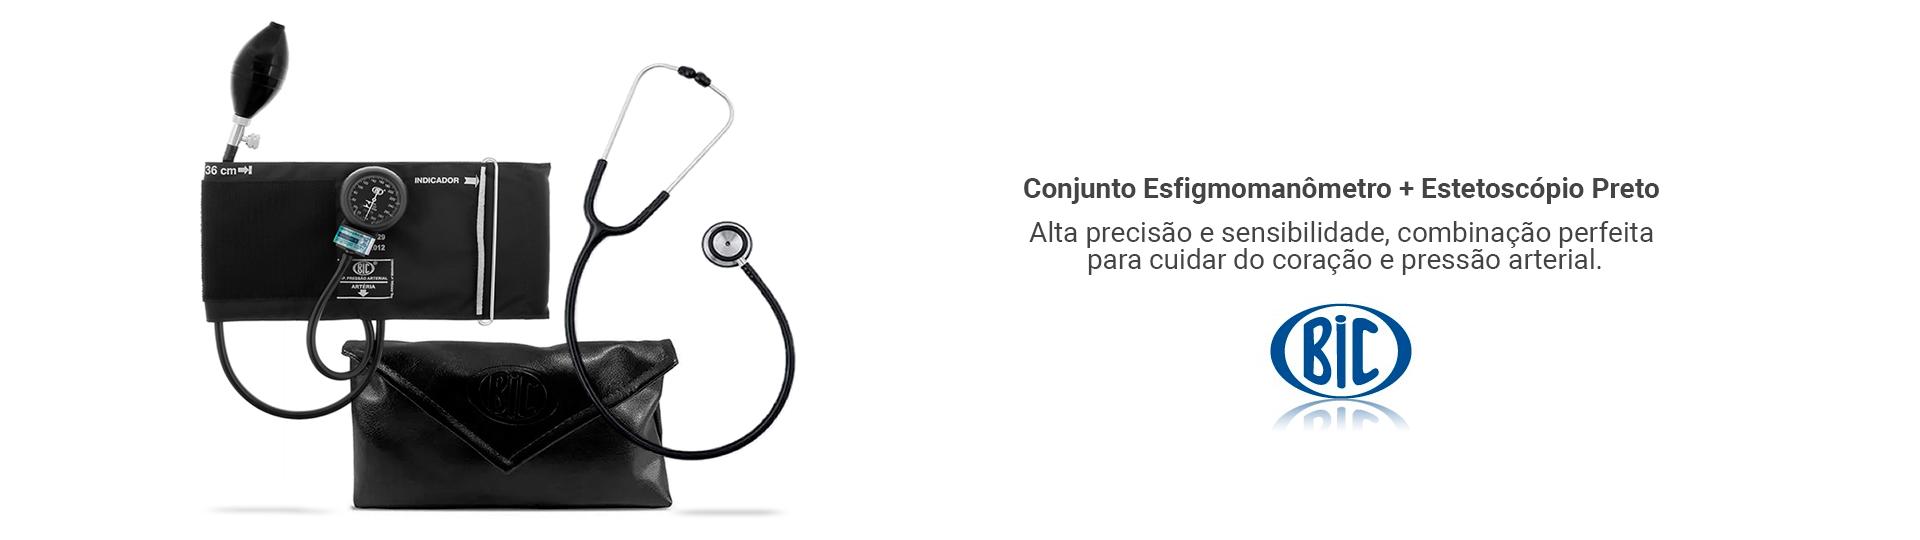 Conjunto Esfigmomanômetro e Estetoscópio BIC